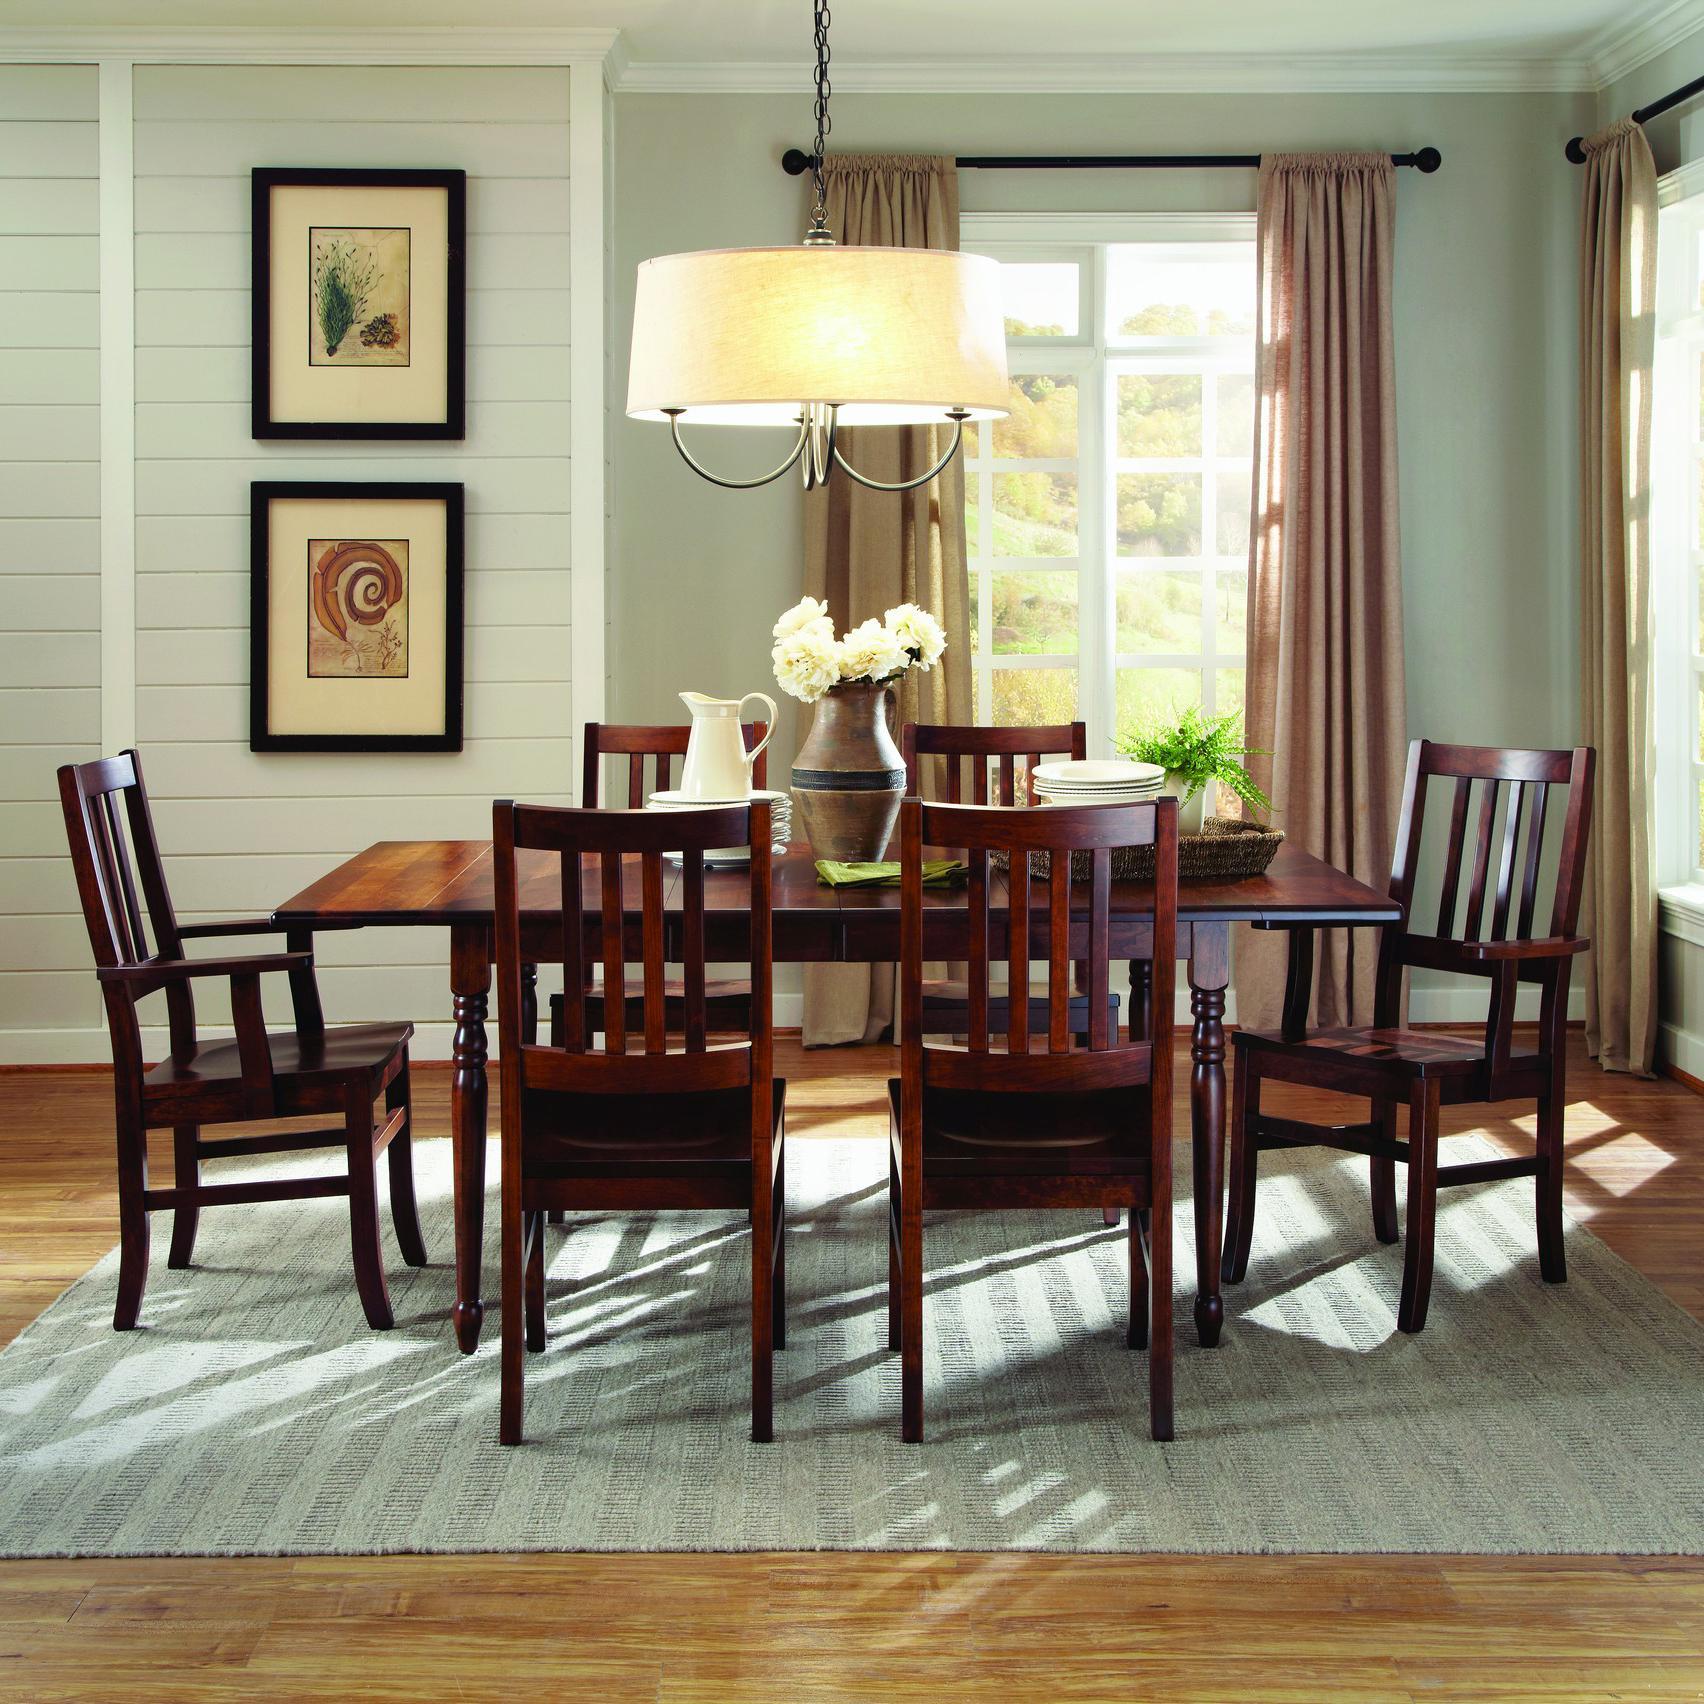 Customizable 7 Pc. Drop Leaf Table & Chair Set